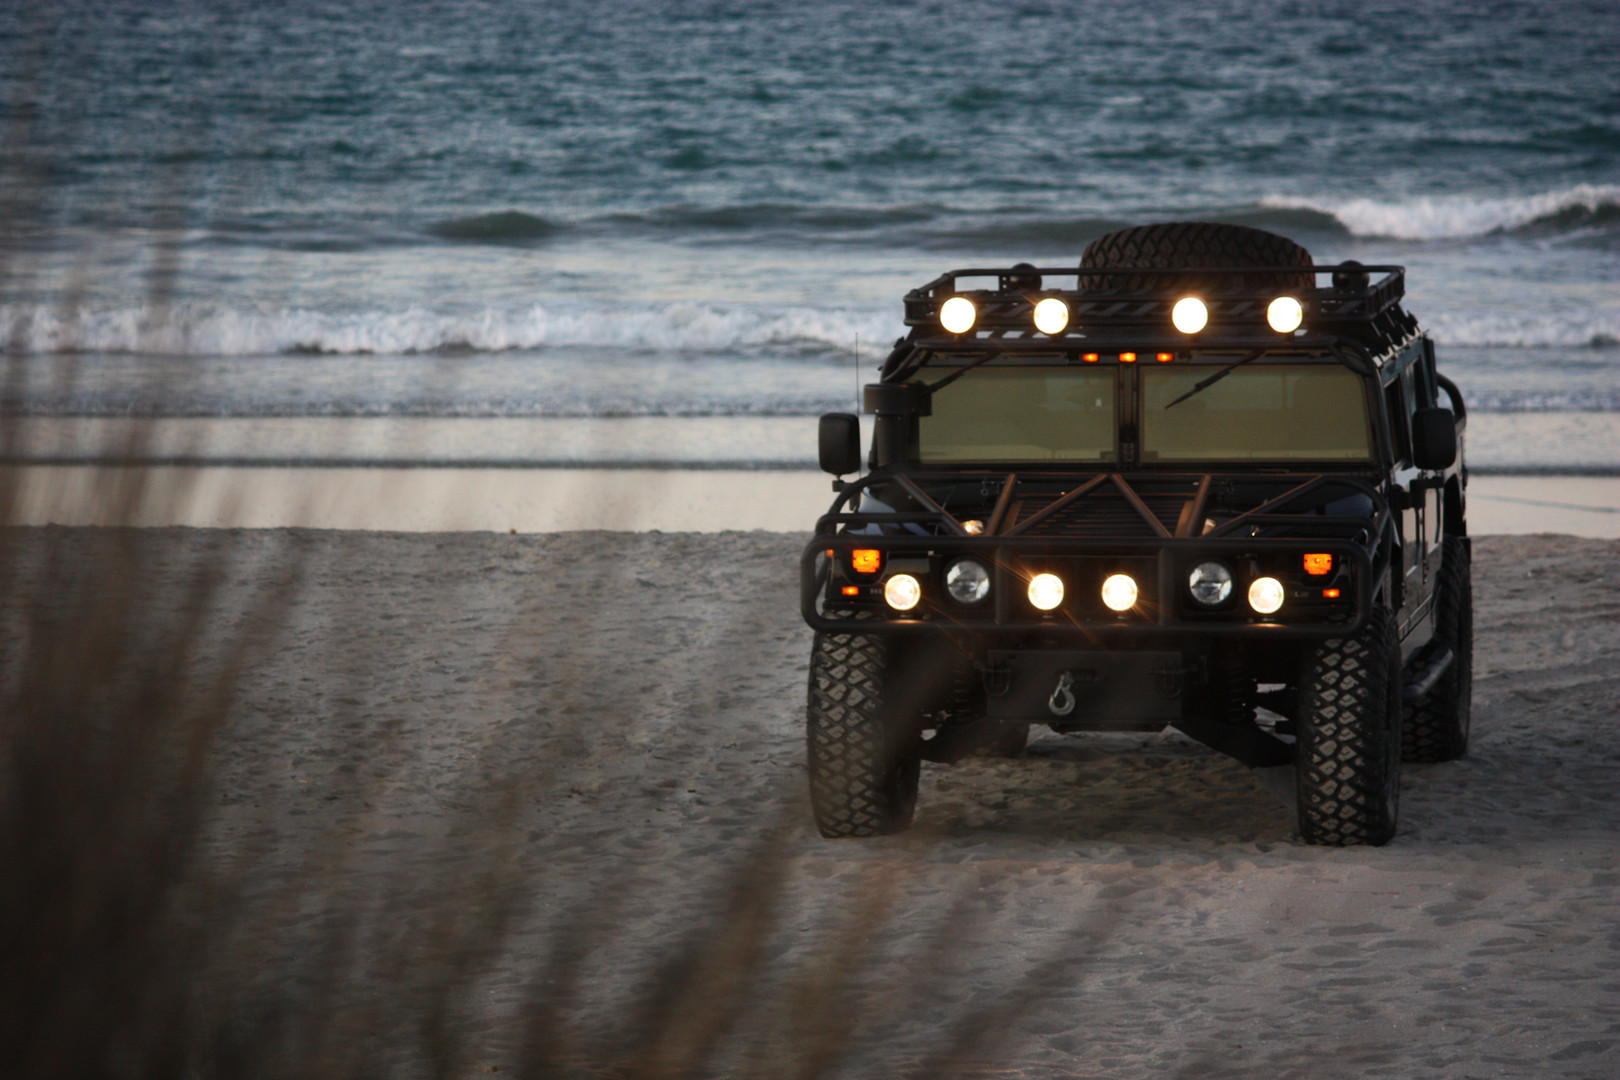 2000 AM General Hummer White (102).JPG